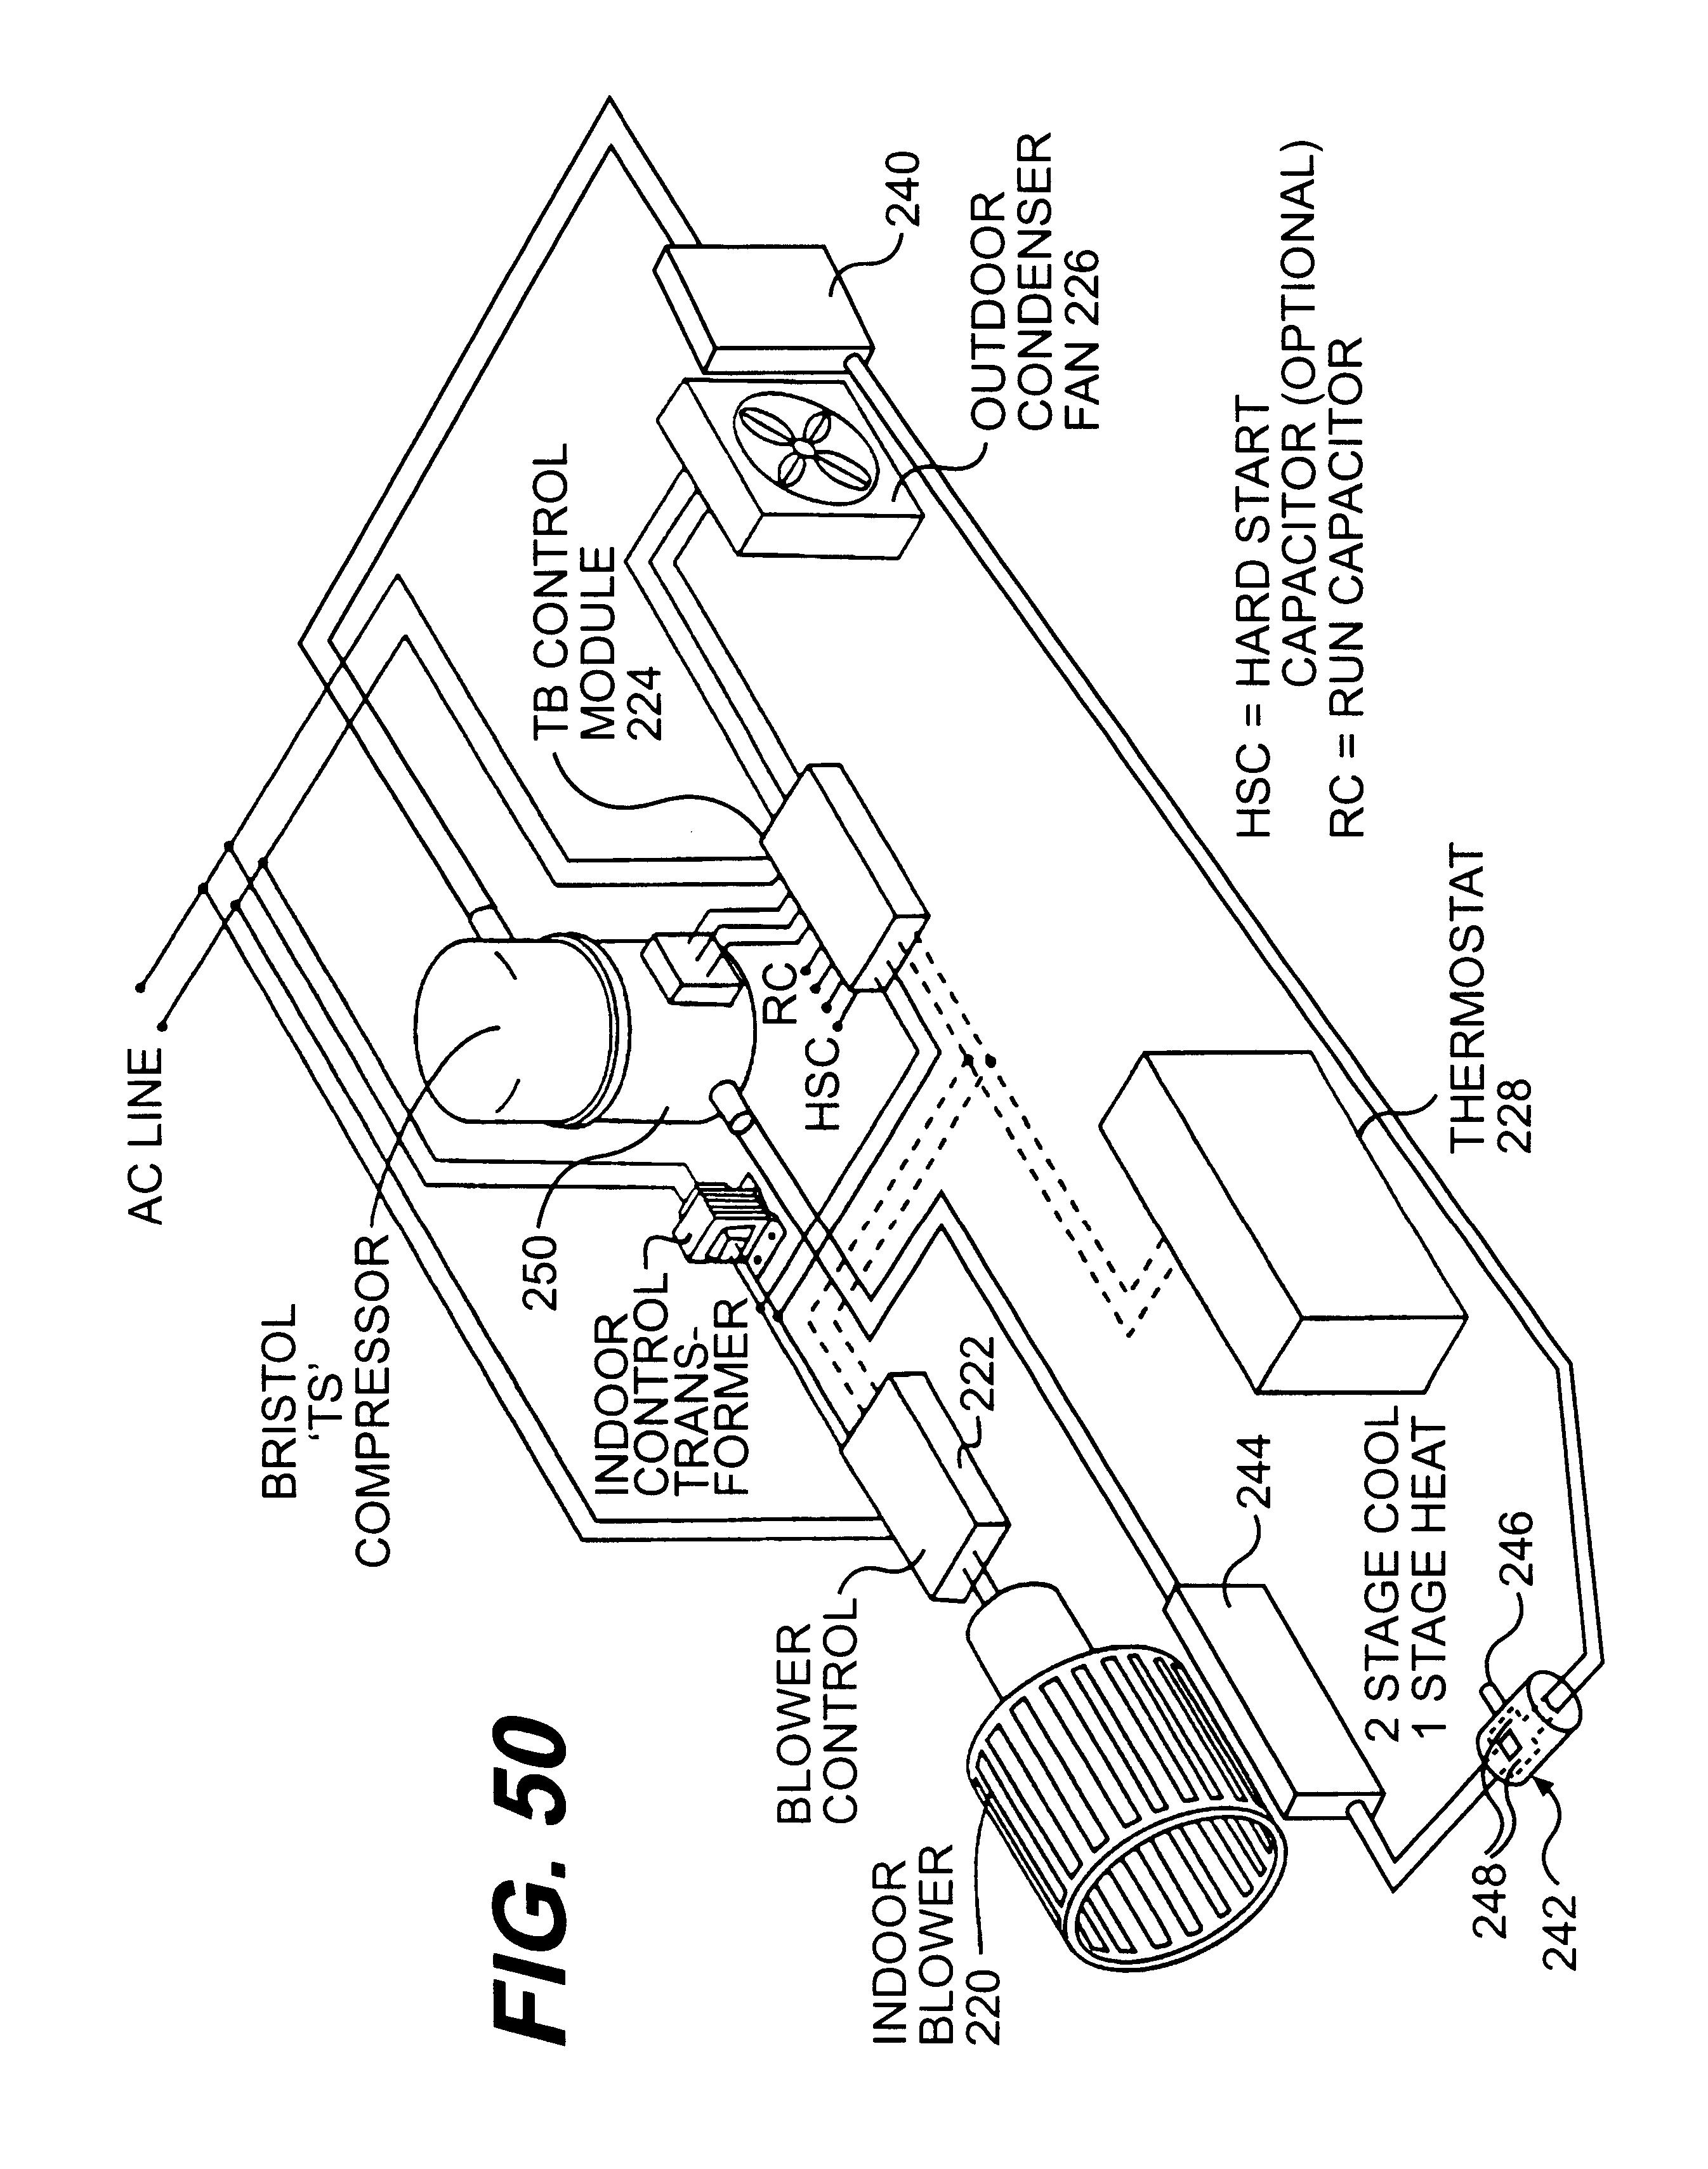 Bristol Compressor Wiring Diagram from patentimages.storage.googleapis.com